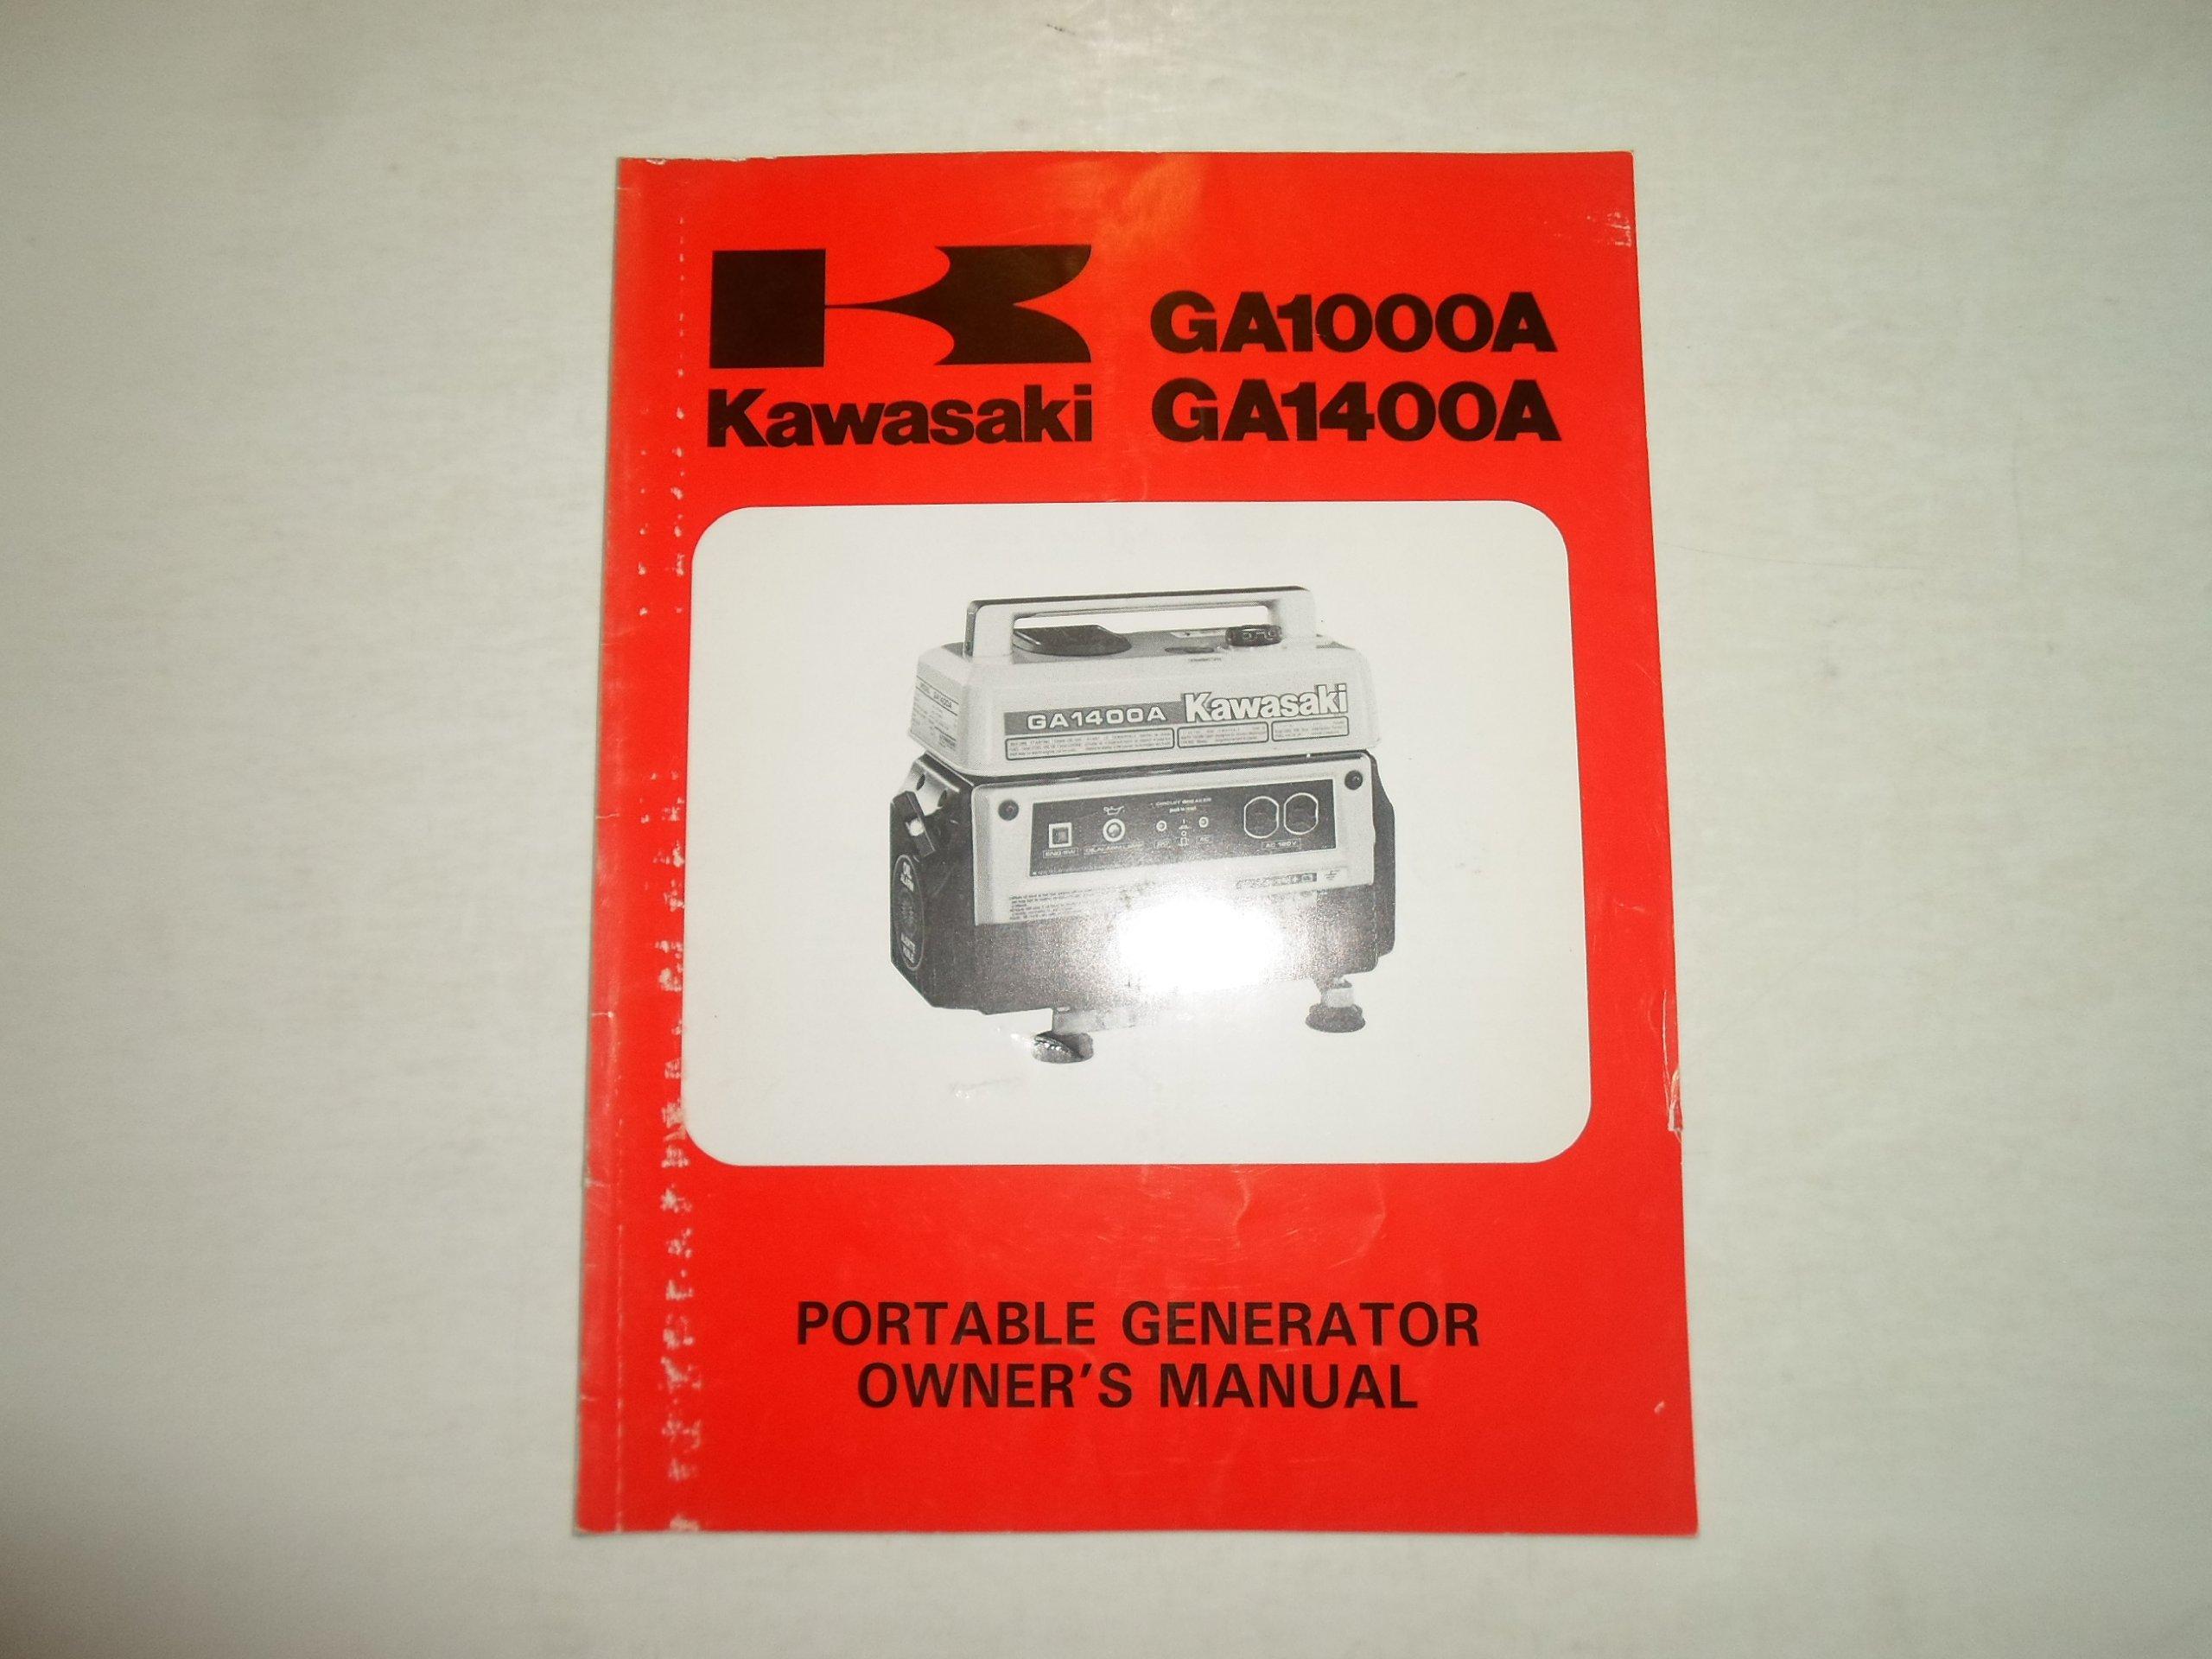 7b75e74f093c ... Array - kawasaki ga1000a ga1400a portable generator owners manual  factory rh amazon com